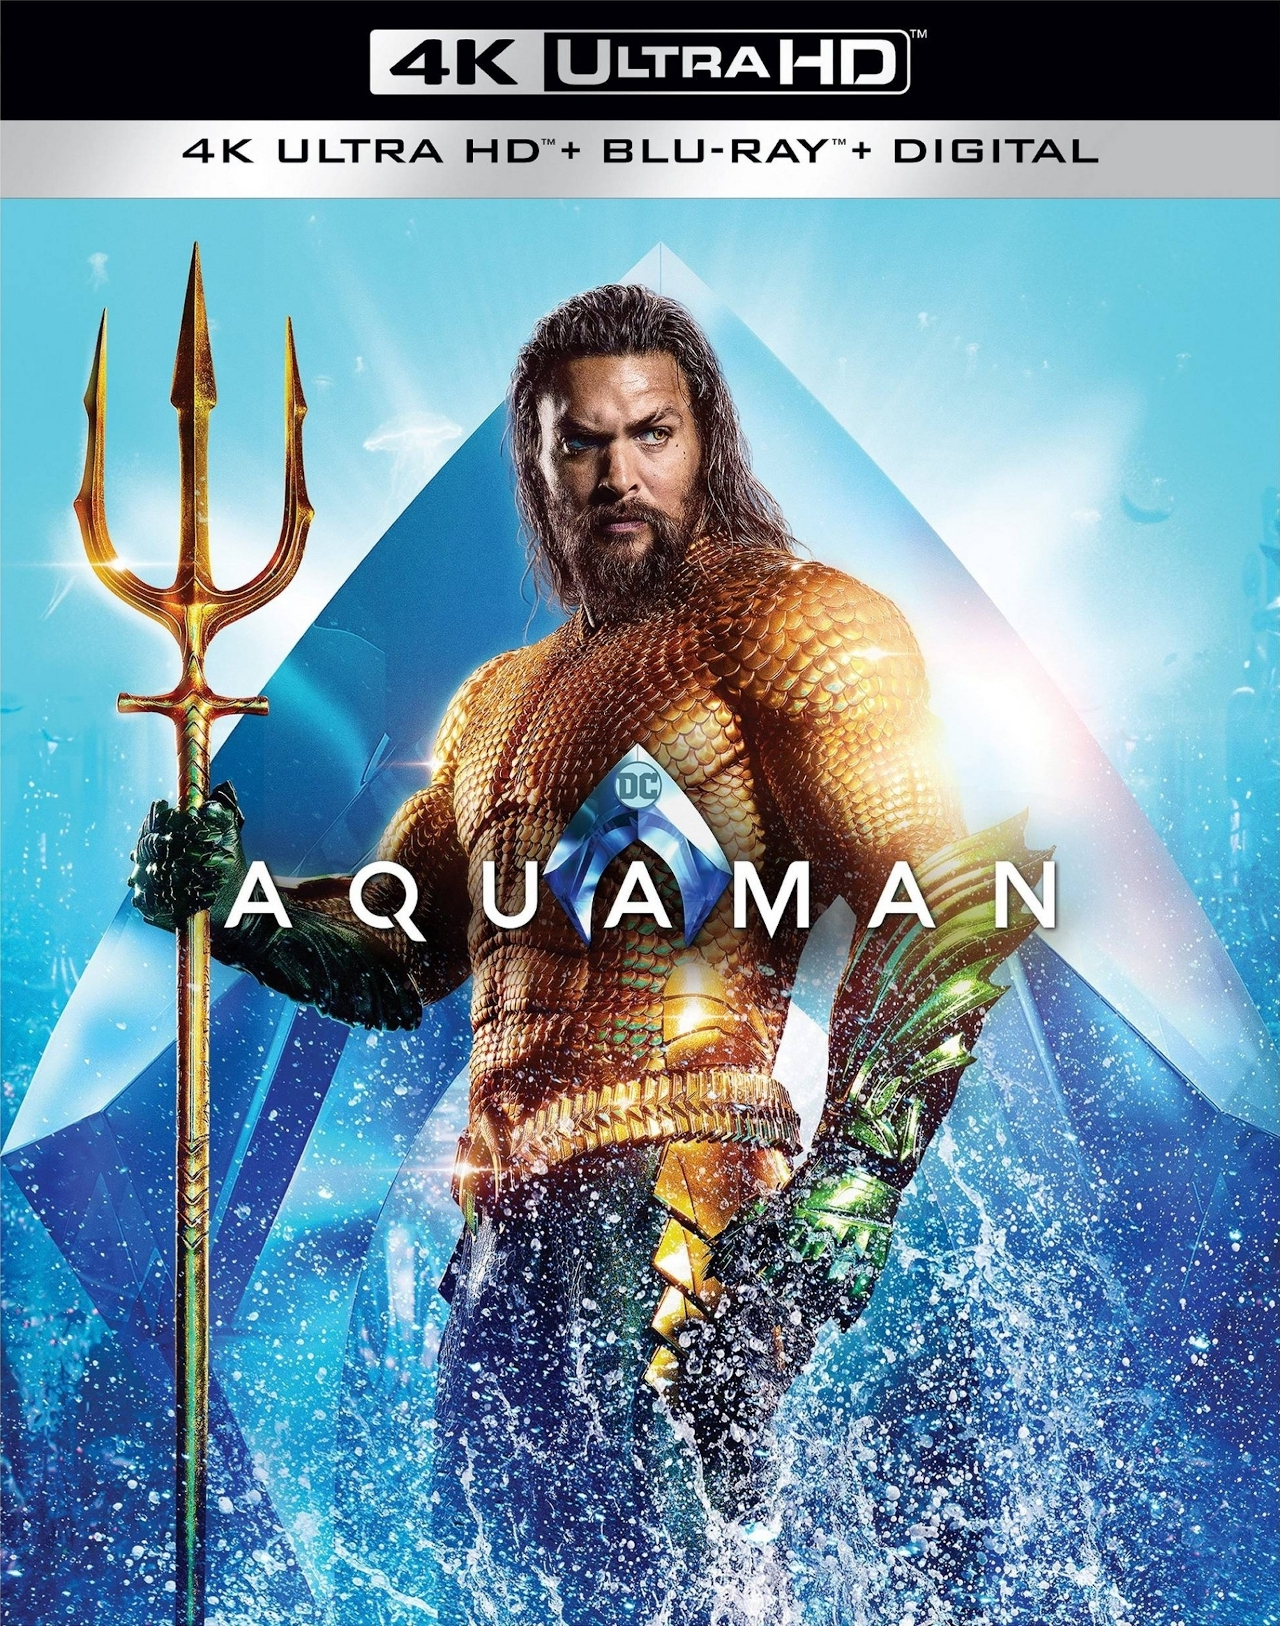 Aquaman 4K UHD - Best 4K Blu-ray DC Superhero Movies